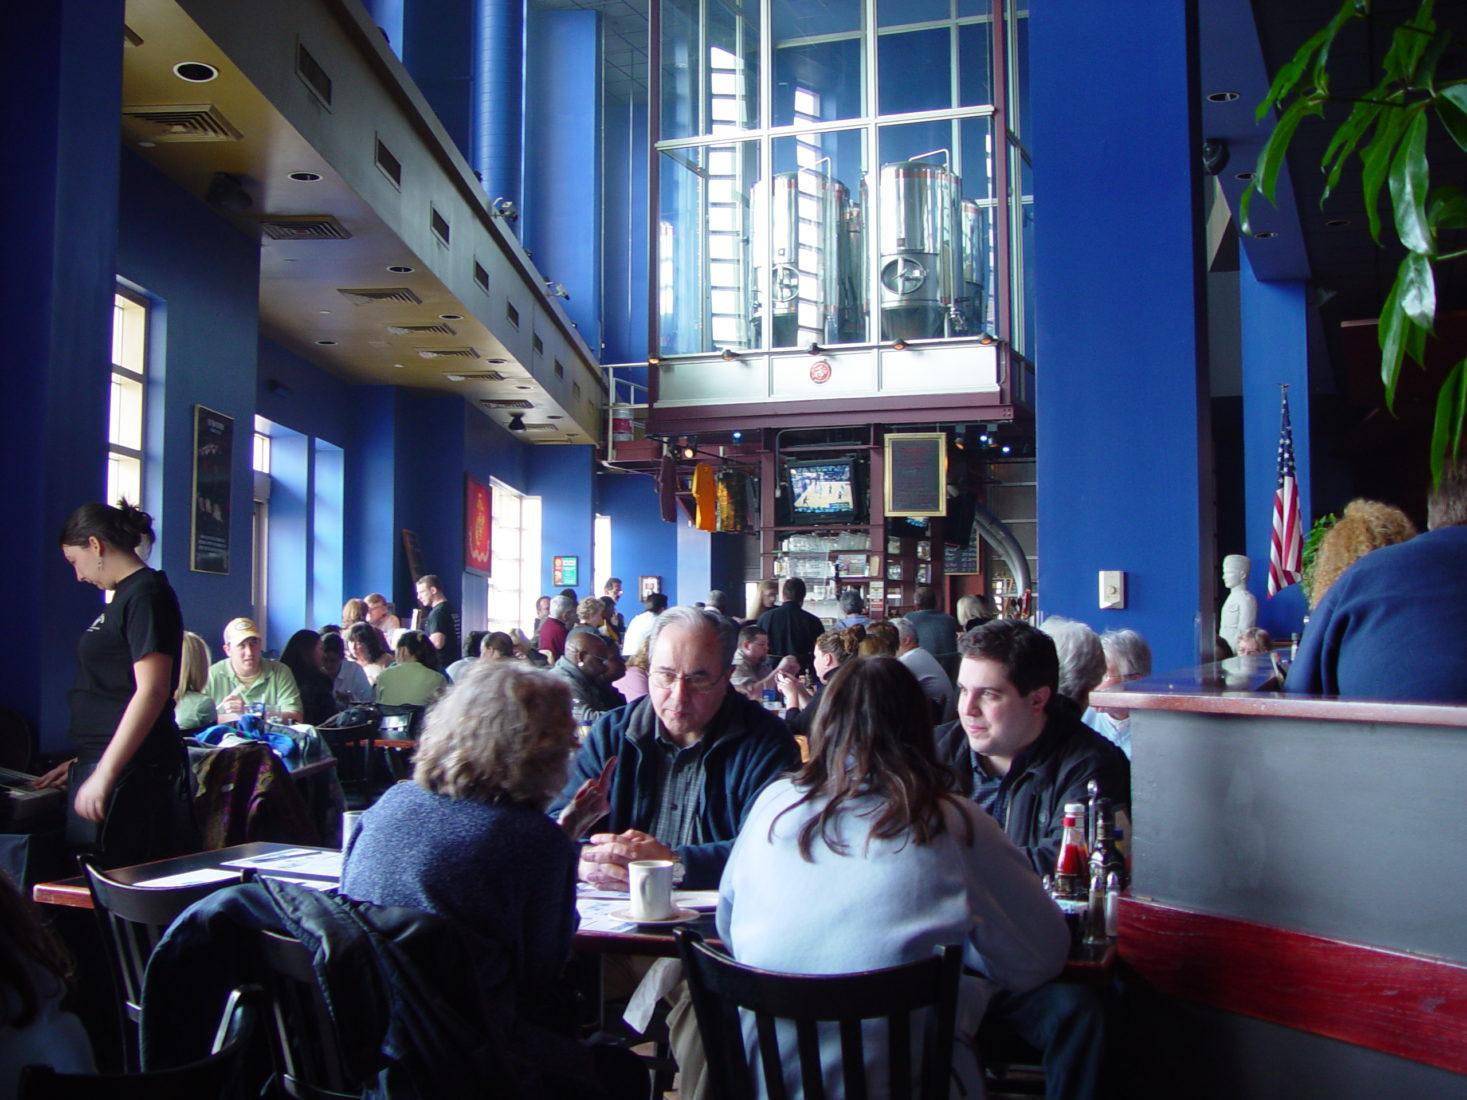 56. Tun Tavern, Atlantic City NJ 2005